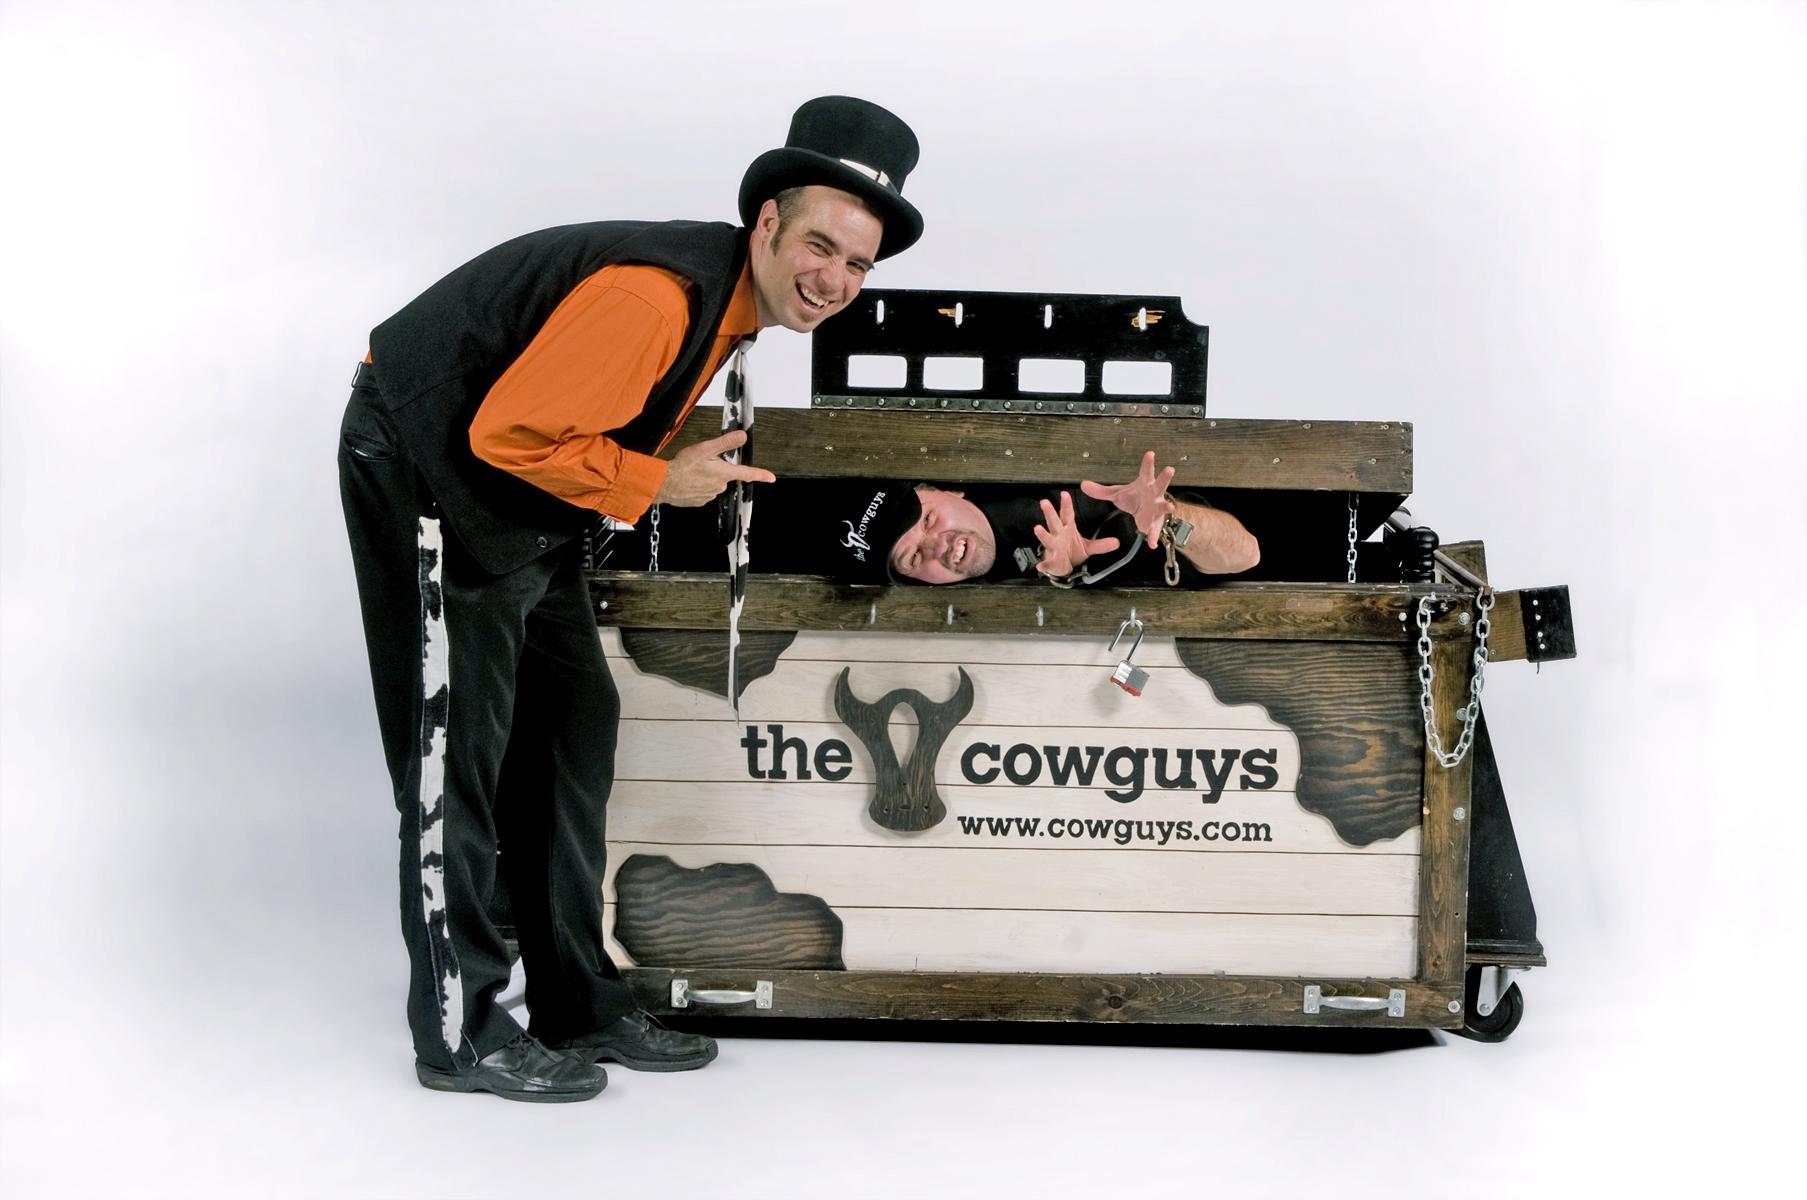 Cowguyspromo4lockedinbox